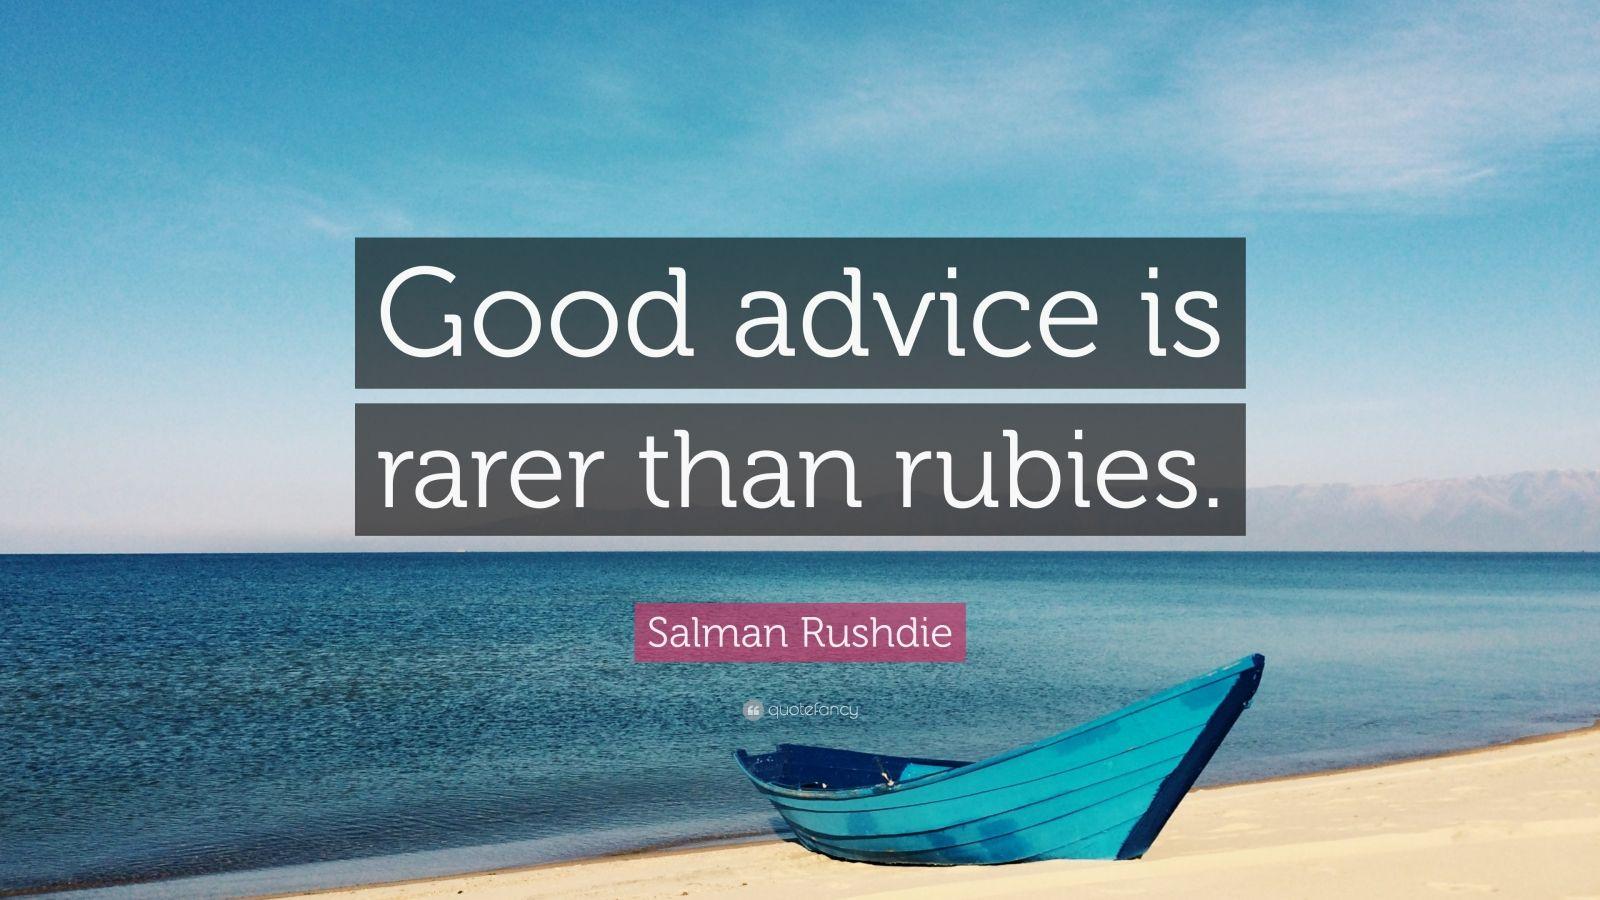 good advice is rarer than rubies by salman rushdie essay Sir ahmed salman rushdie a the collection of stories from which 'good advice is rarer than rubies good advices is rarer than rubies by salman rushdie.